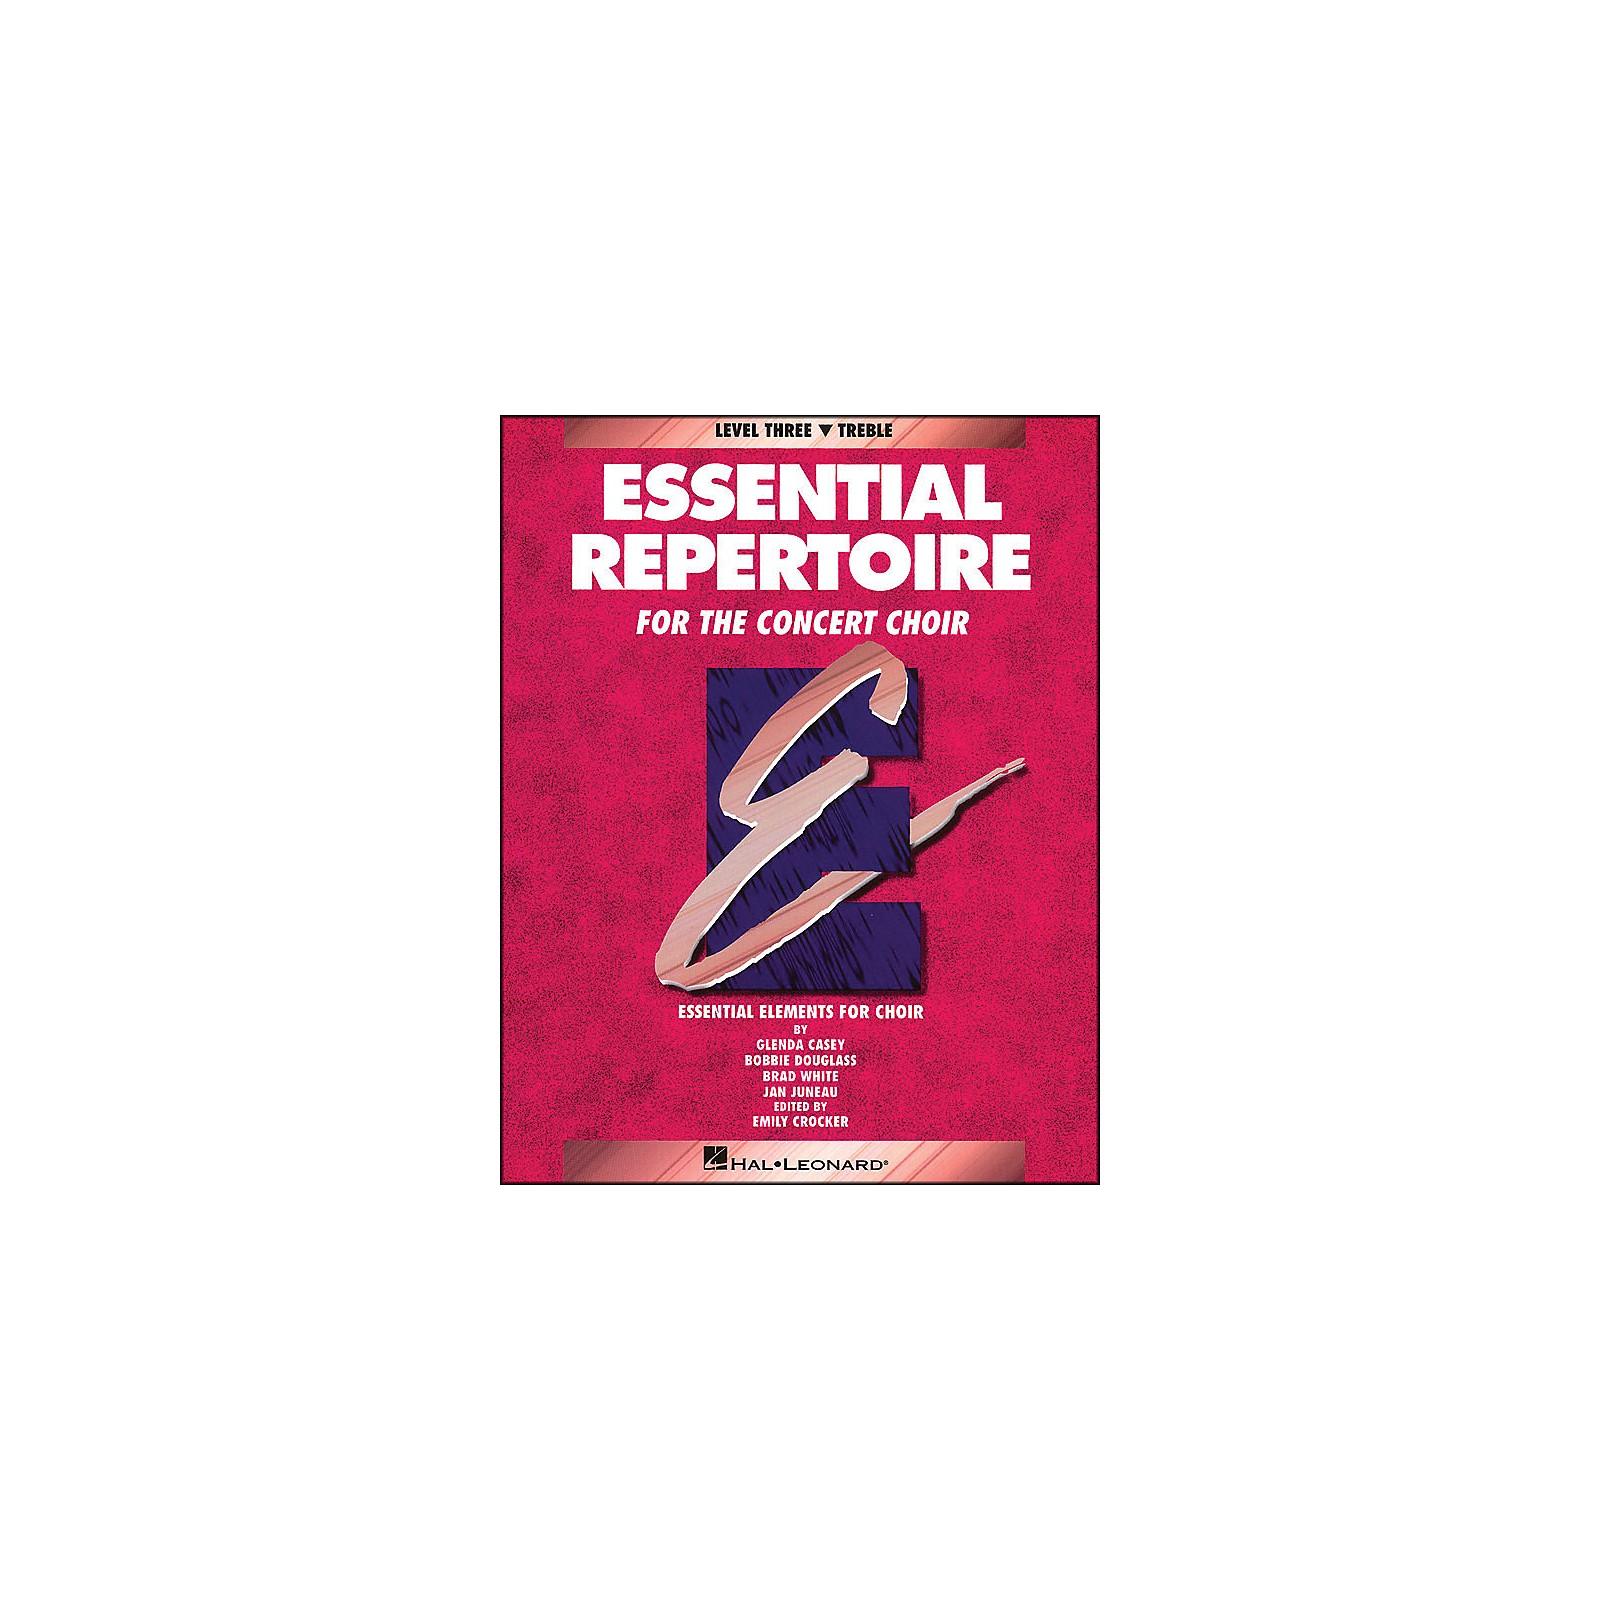 Hal Leonard Essential Repertoire for The Concert Choir Level Three (3) Treble/Student